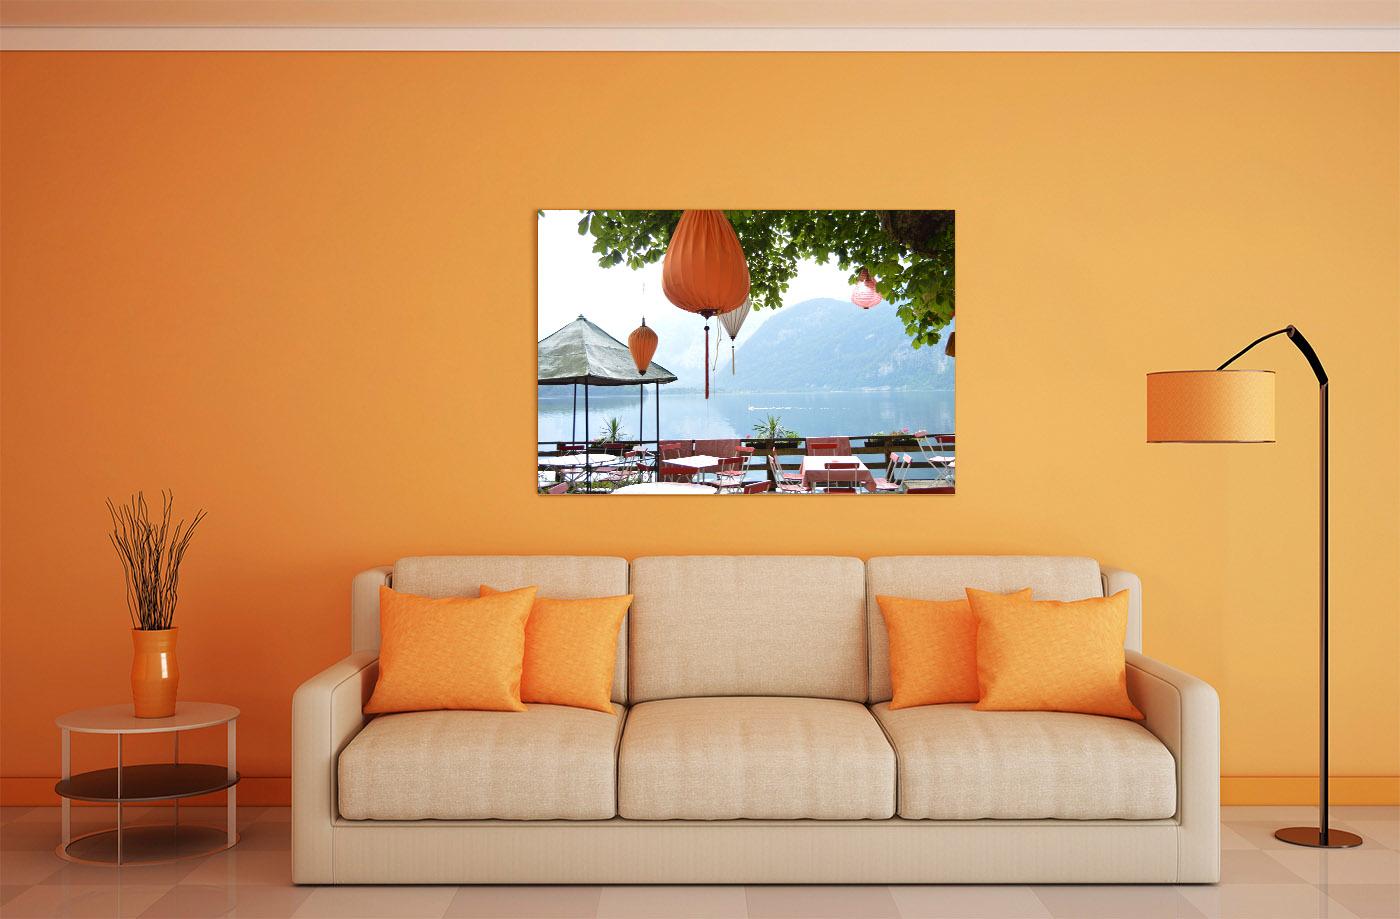 Fotoobraz na zdi